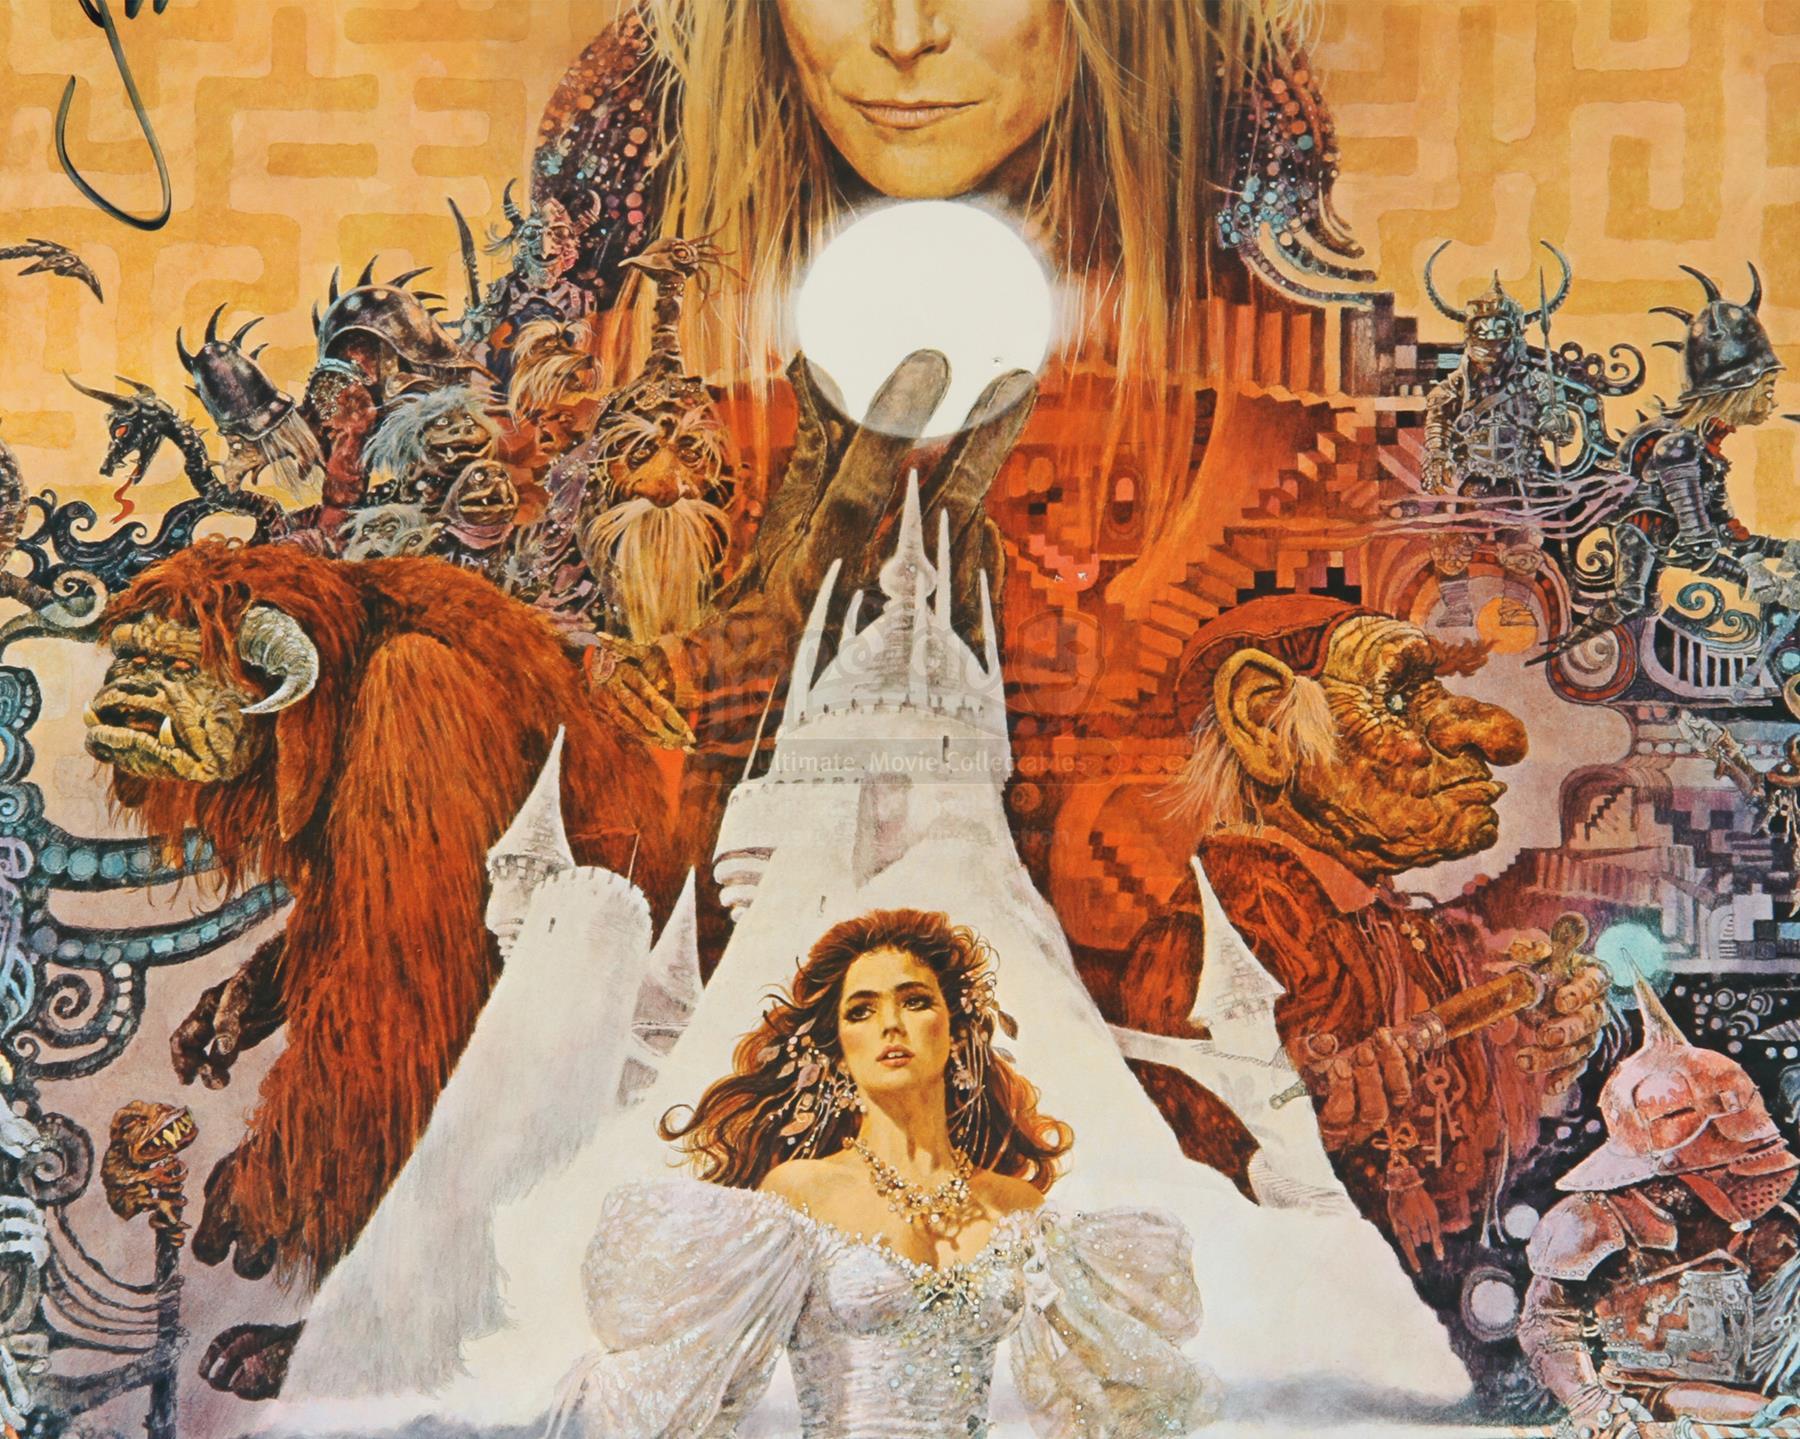 LABYRINTH (1986) - Jim Henson Autographed US One Sheet ... Labyrinth 1986 Poster